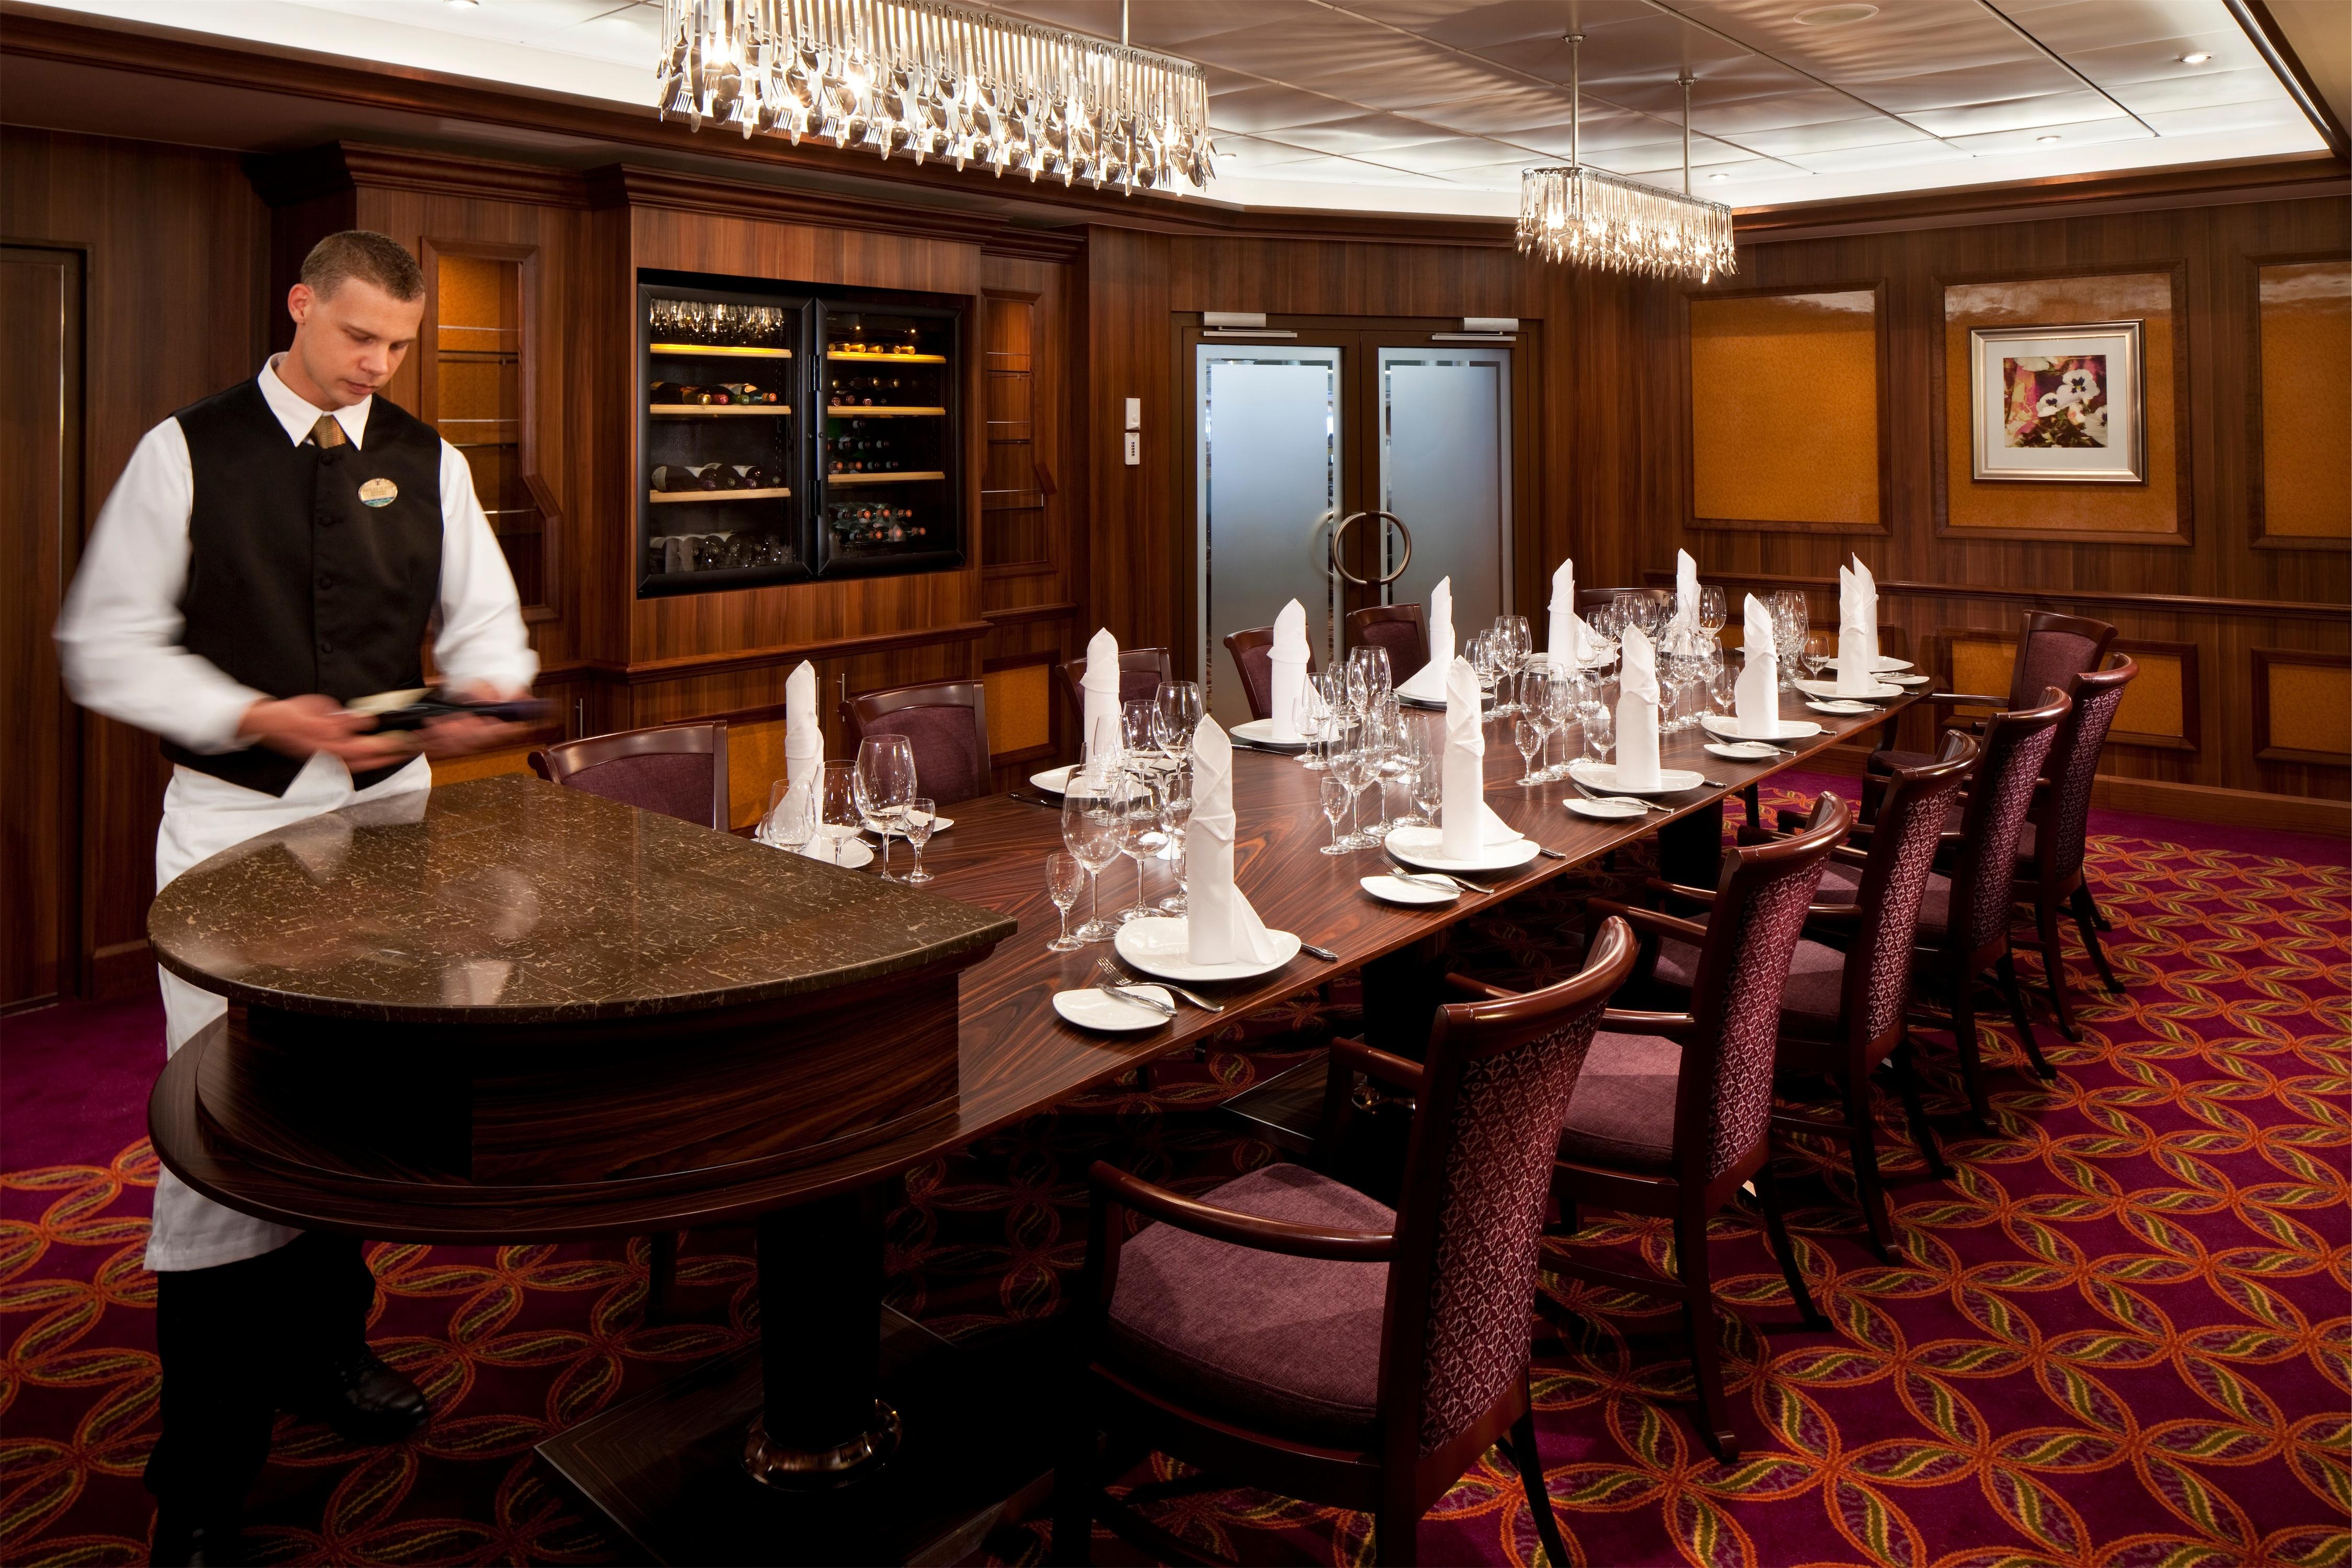 Royal Caribbean International Rhapsody of the Seas Interior Chefs Table.jpg